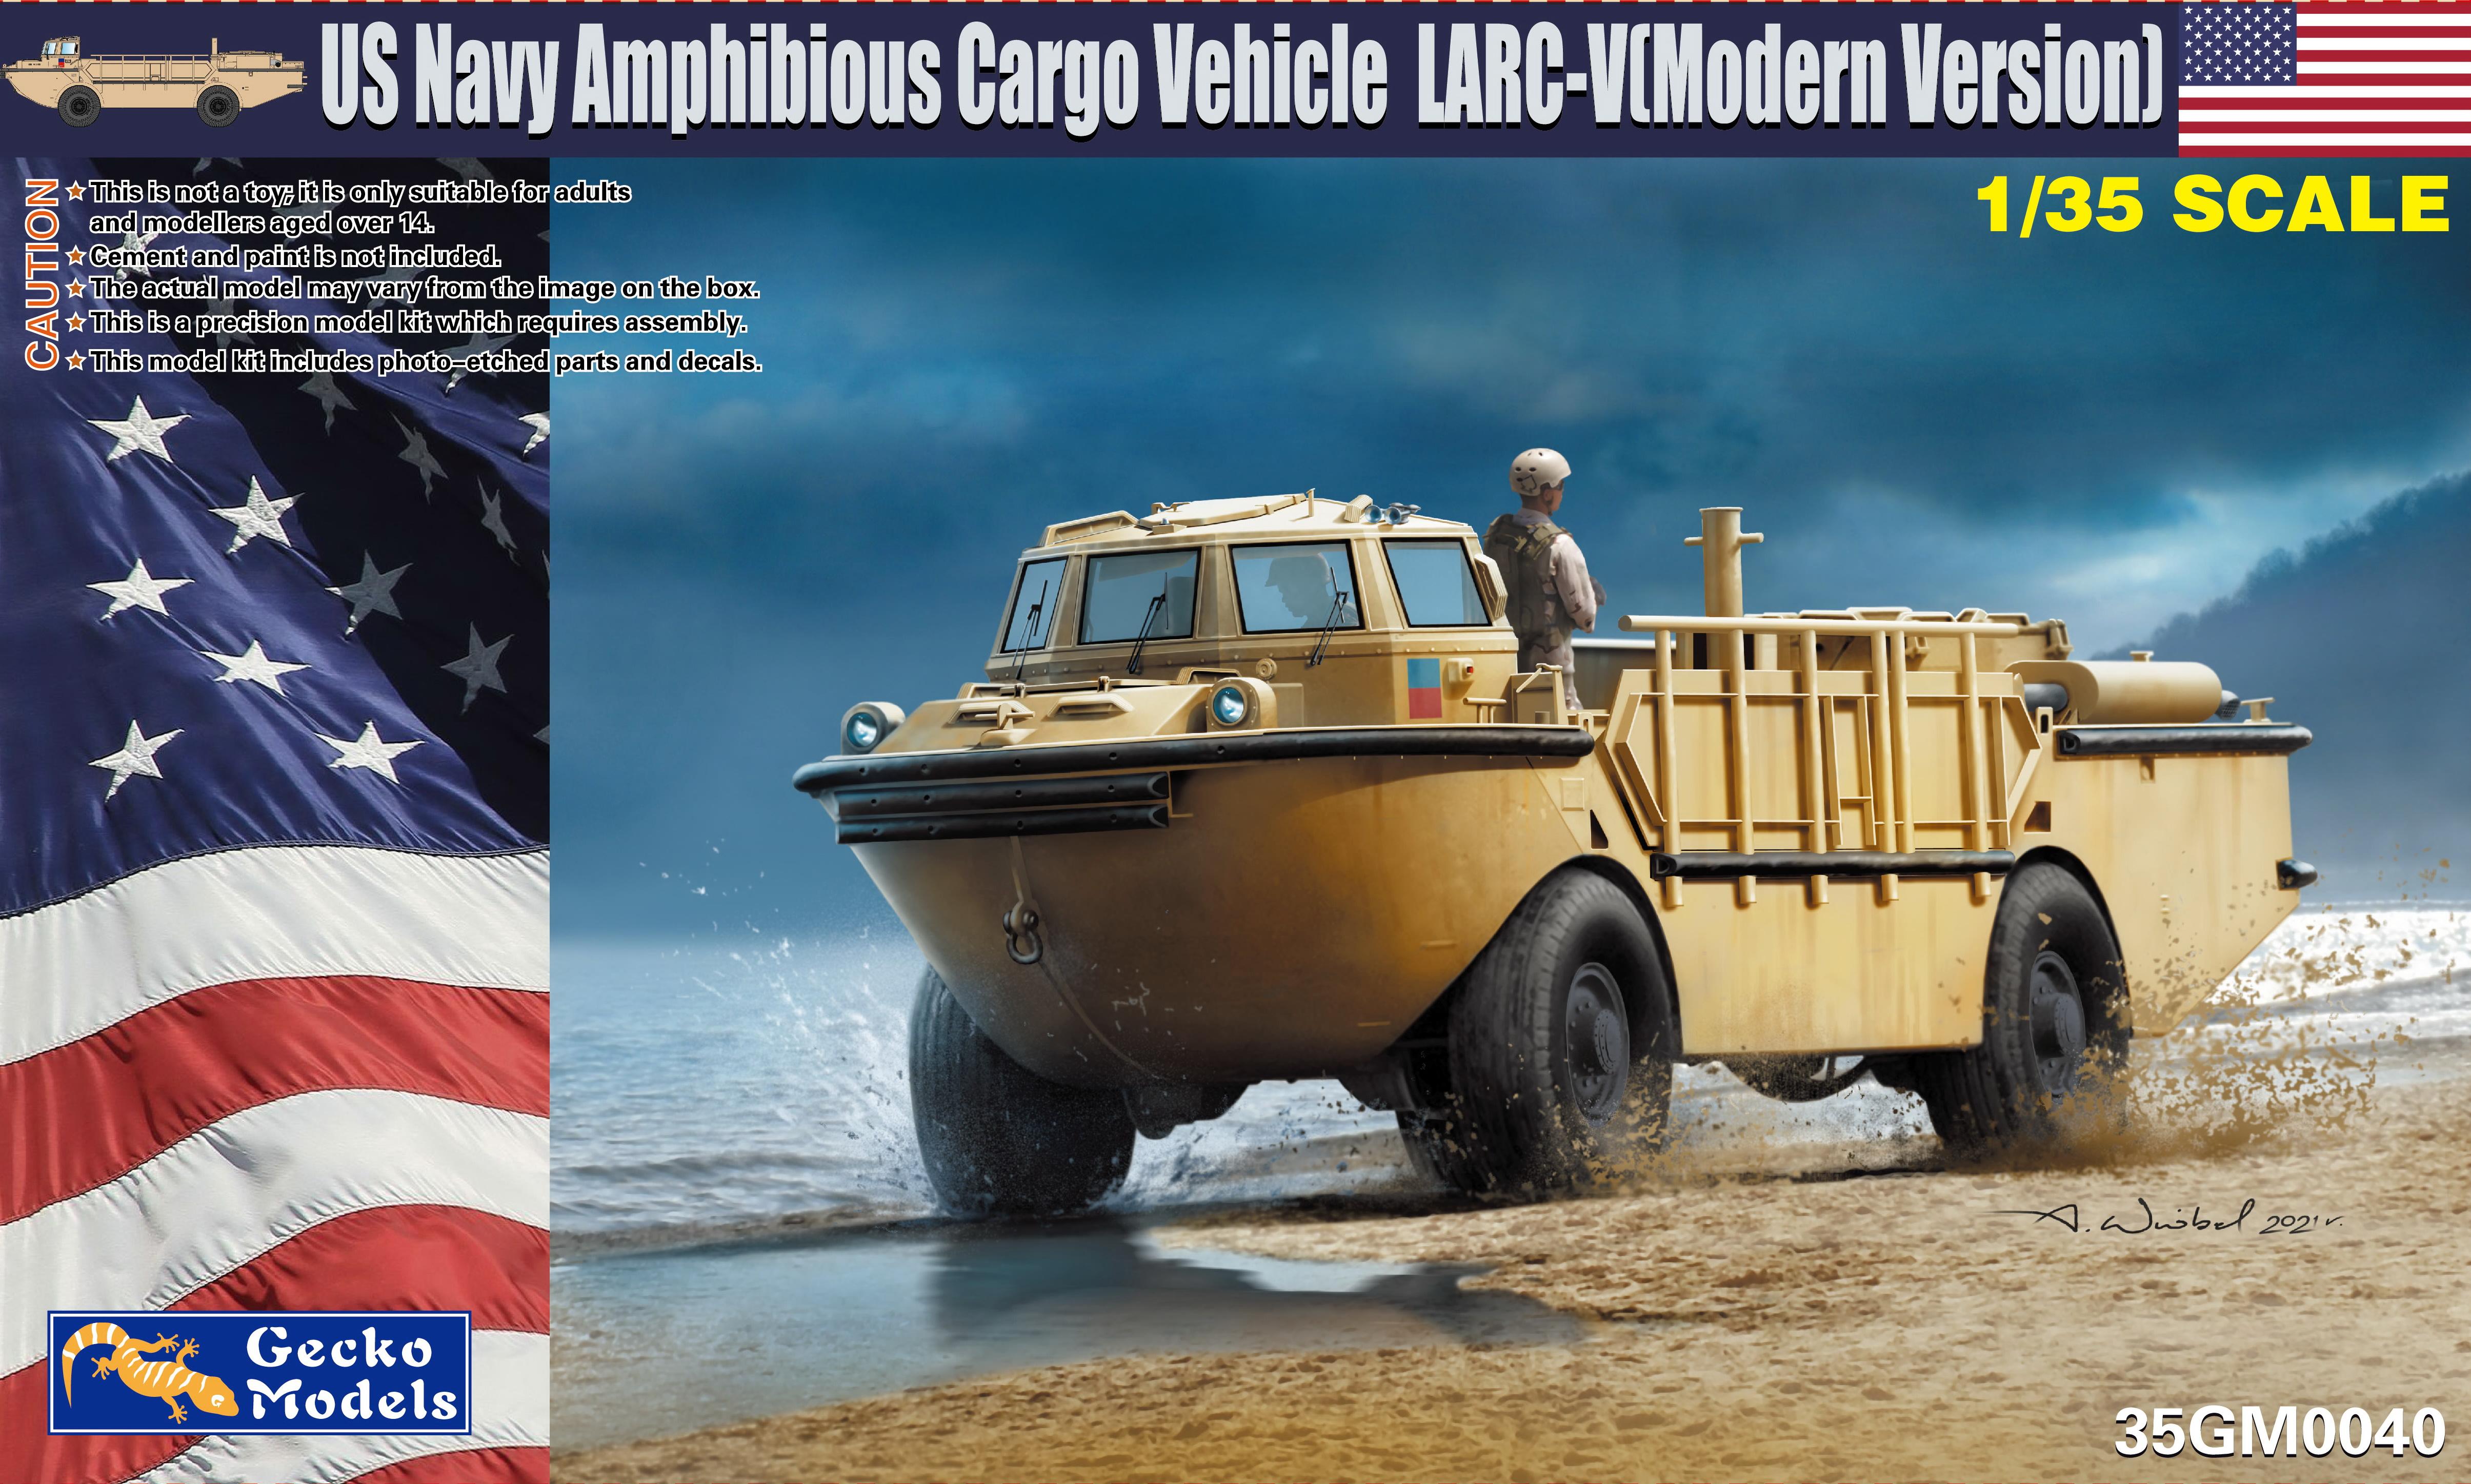 Gecko 1/35 Modern USN LARC-V w-Combat Rubber Raiding Craft